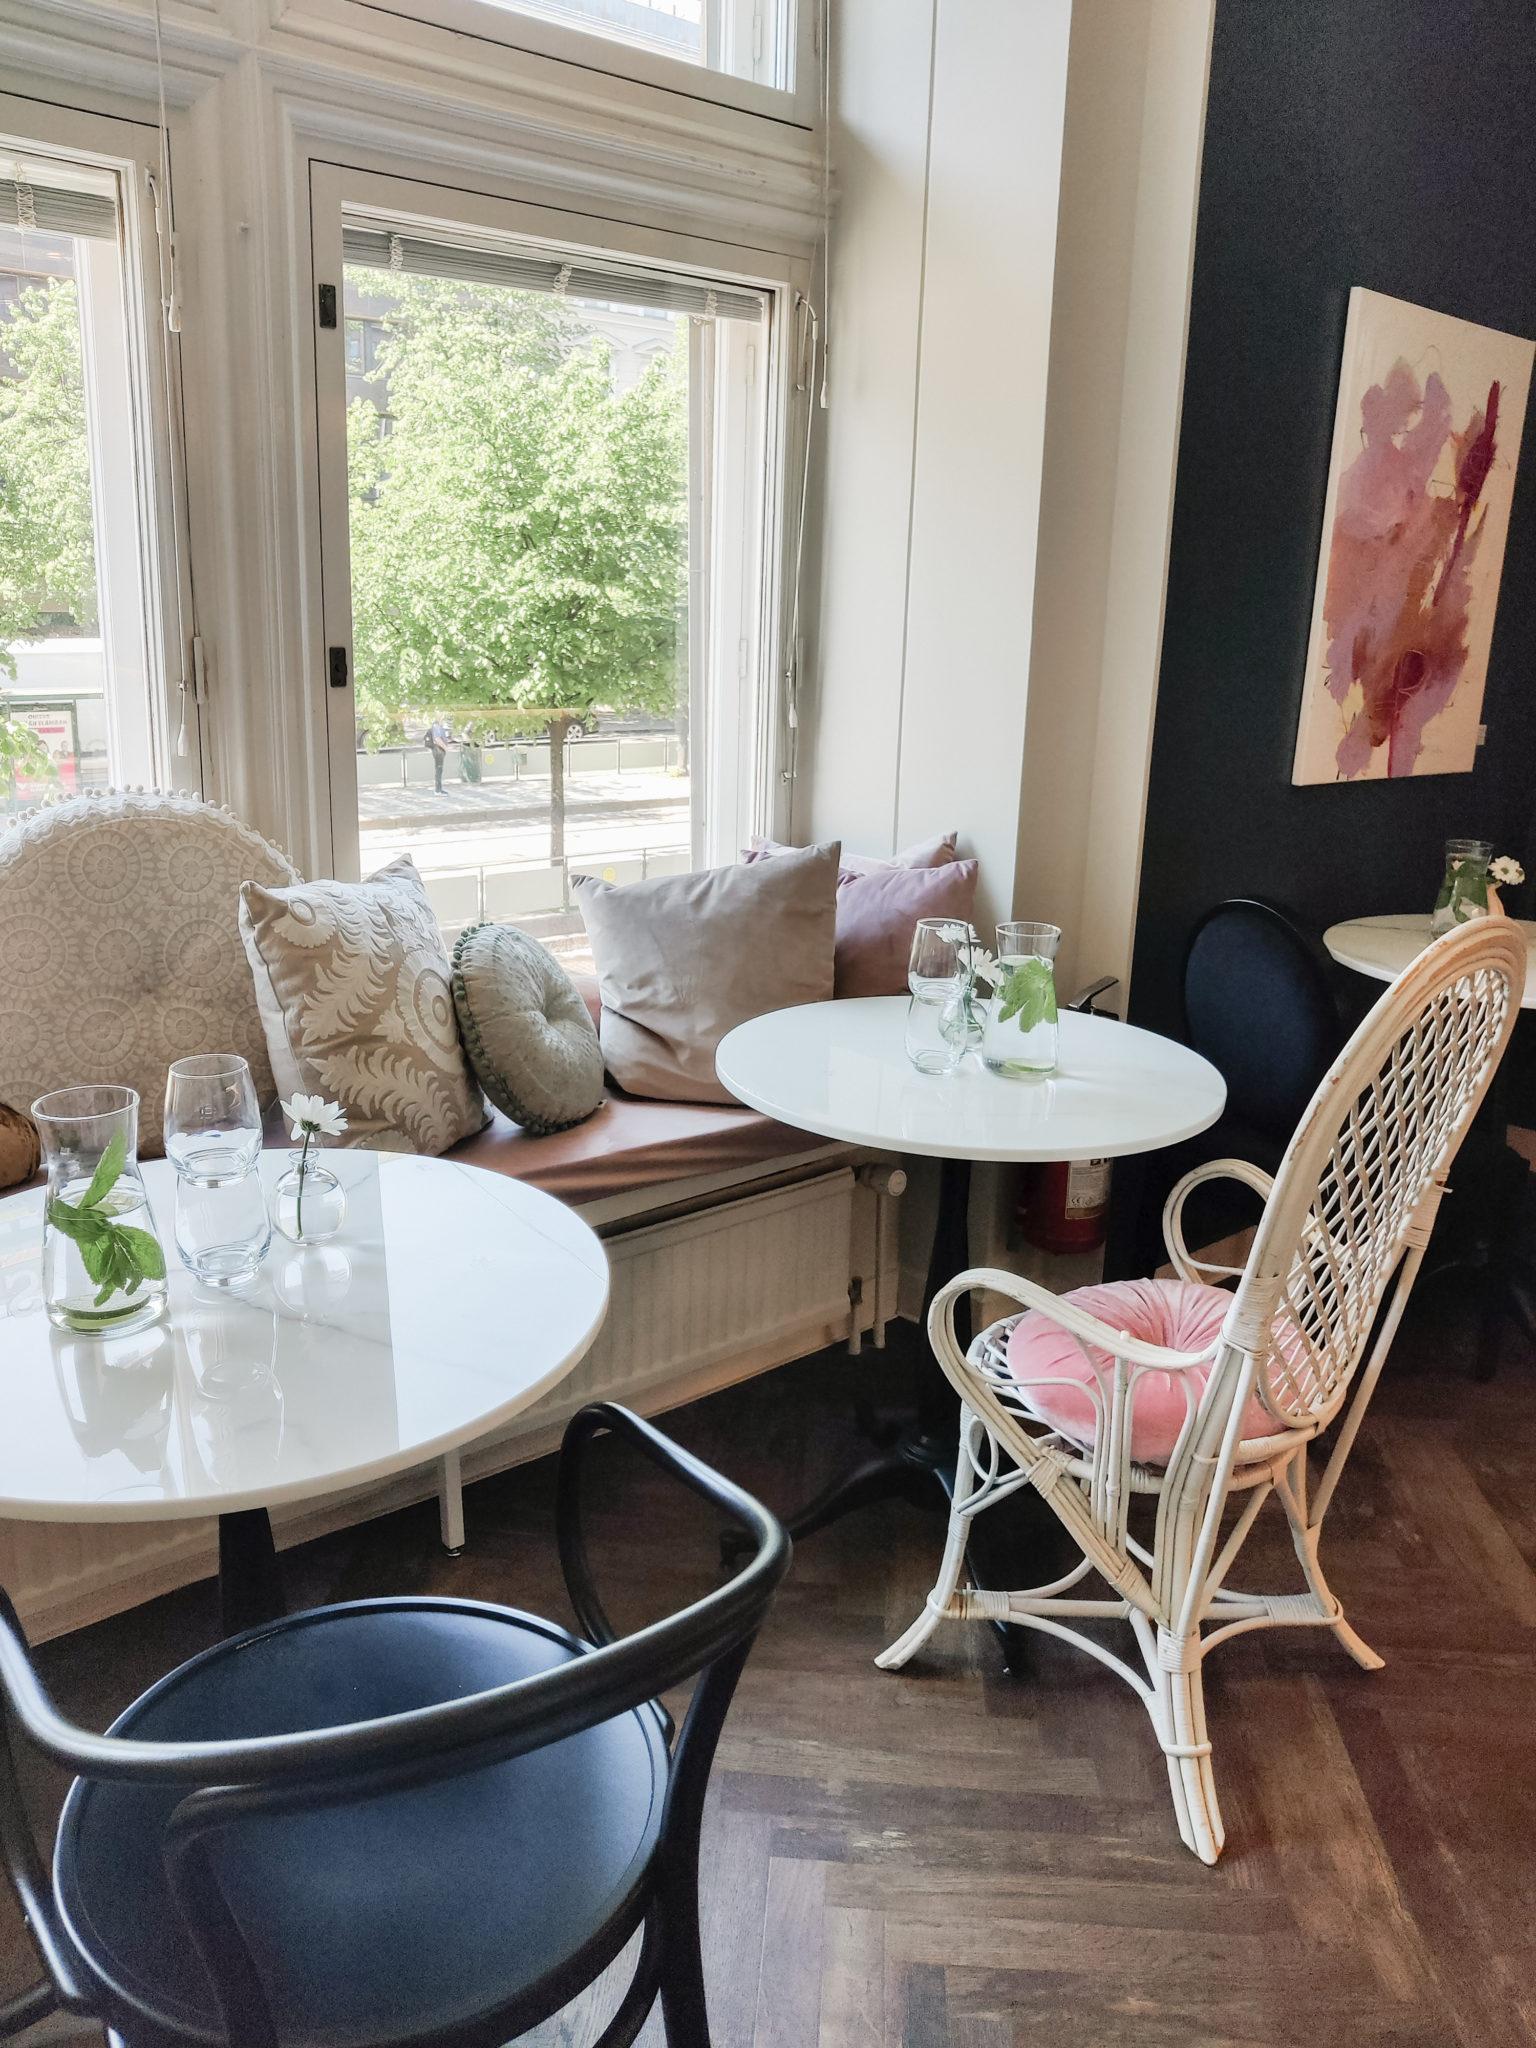 Helsingin ravintolat - Relove Stockmann - BMH - Big mamas home by Jenni